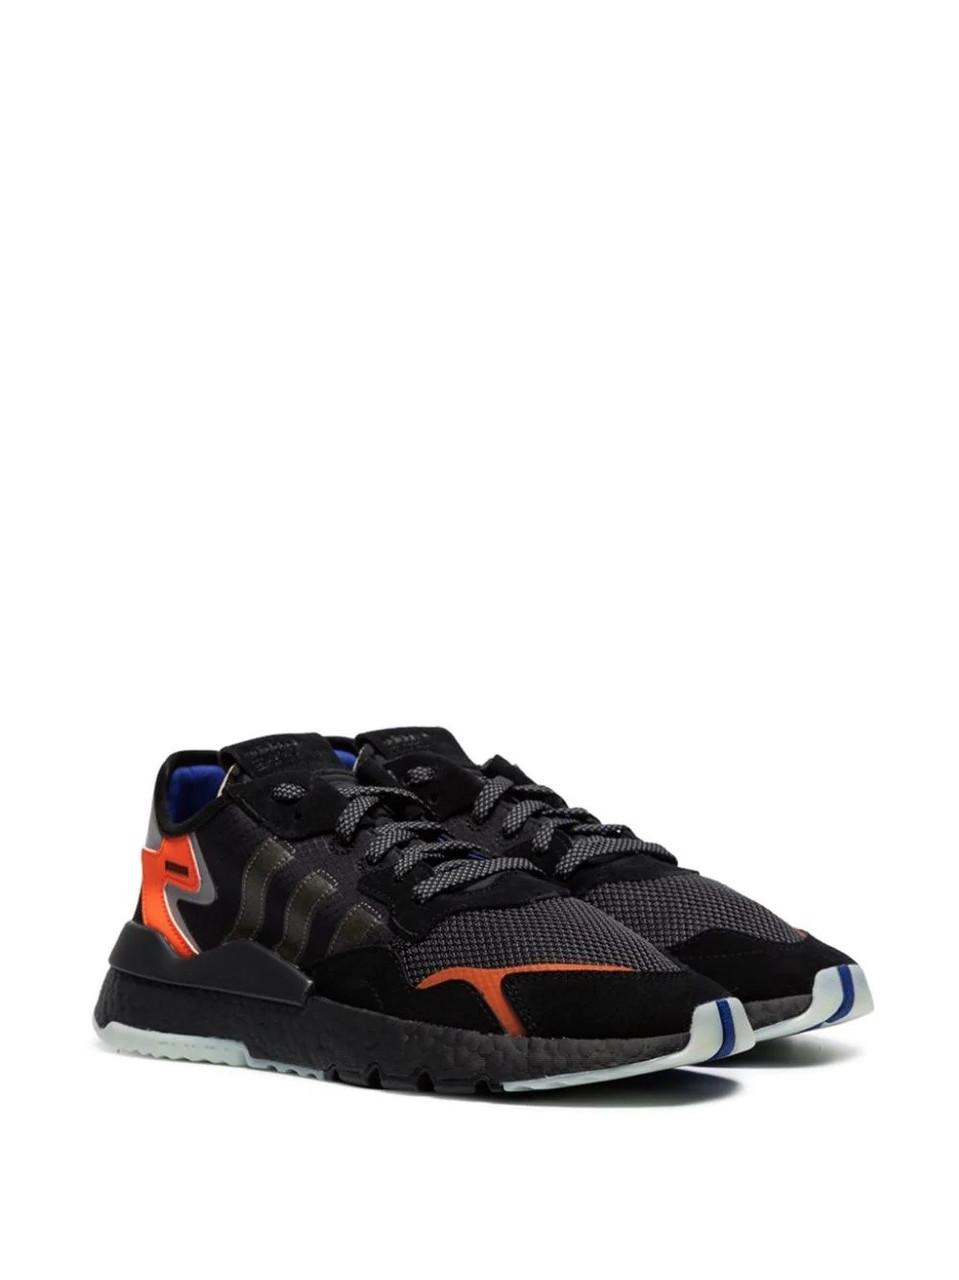 Adidas Nite Jogger OG Black Orange (44(28.5см))